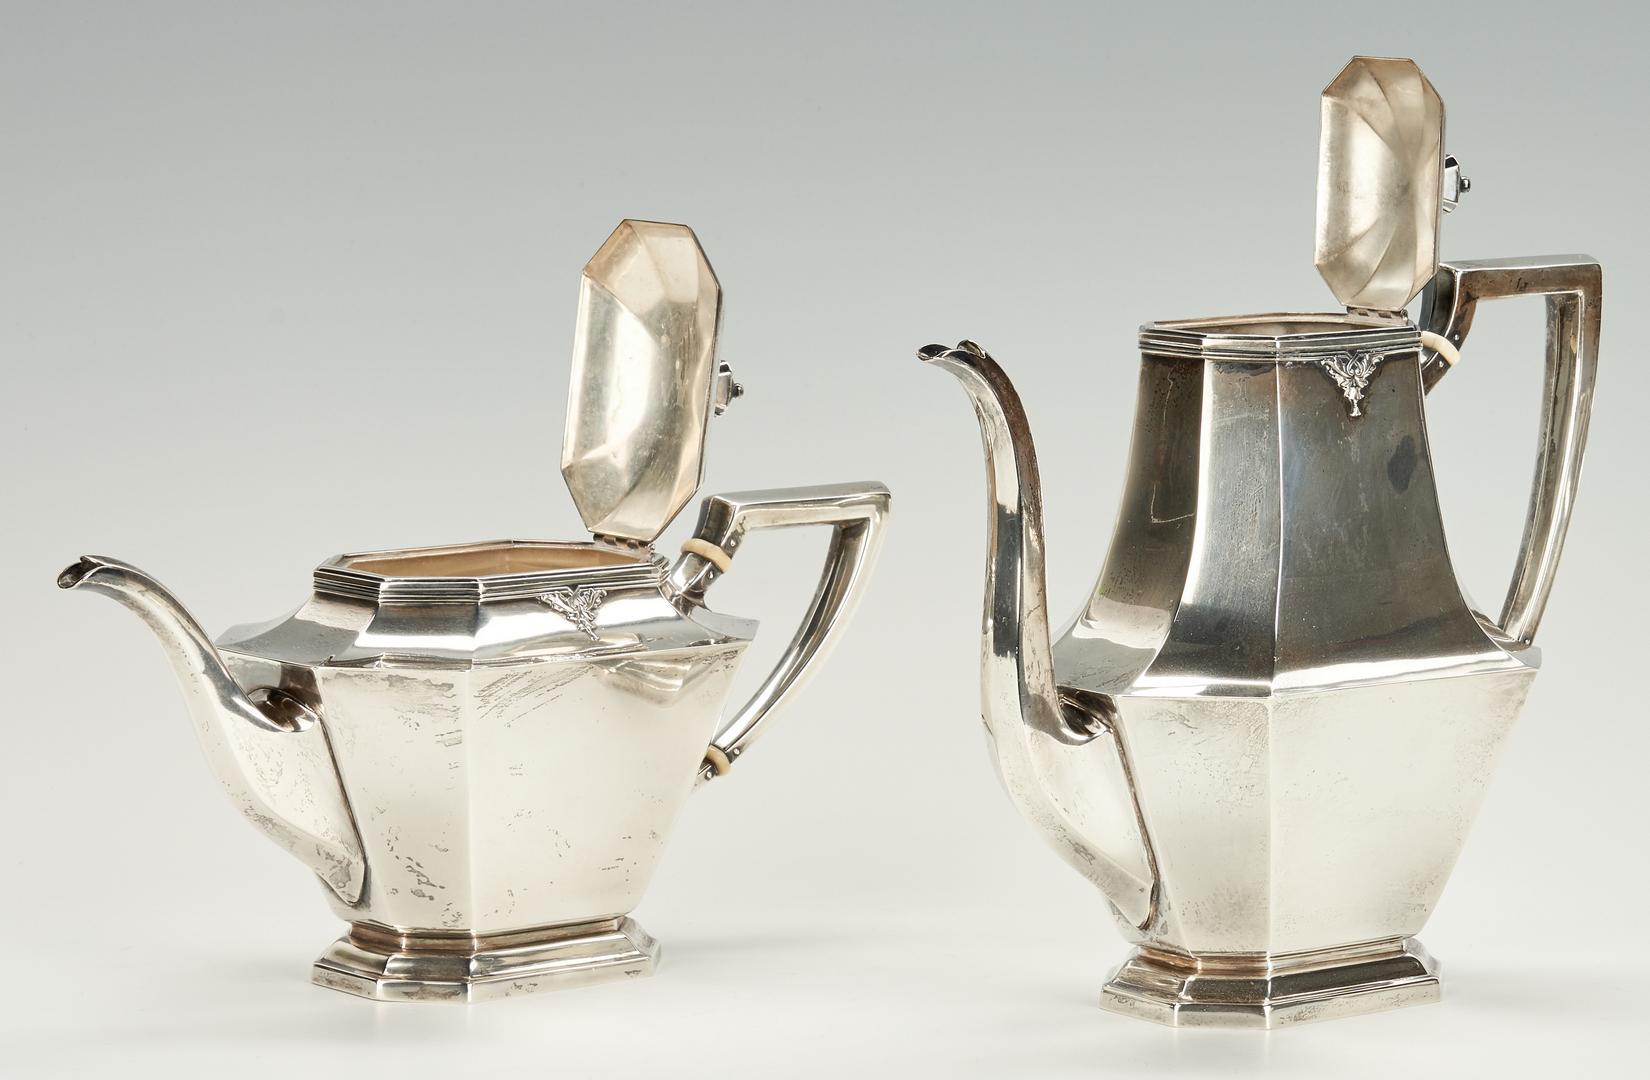 Lot 800: 5 Pc. Sterling Silver Tea Set, Treasure Pattern